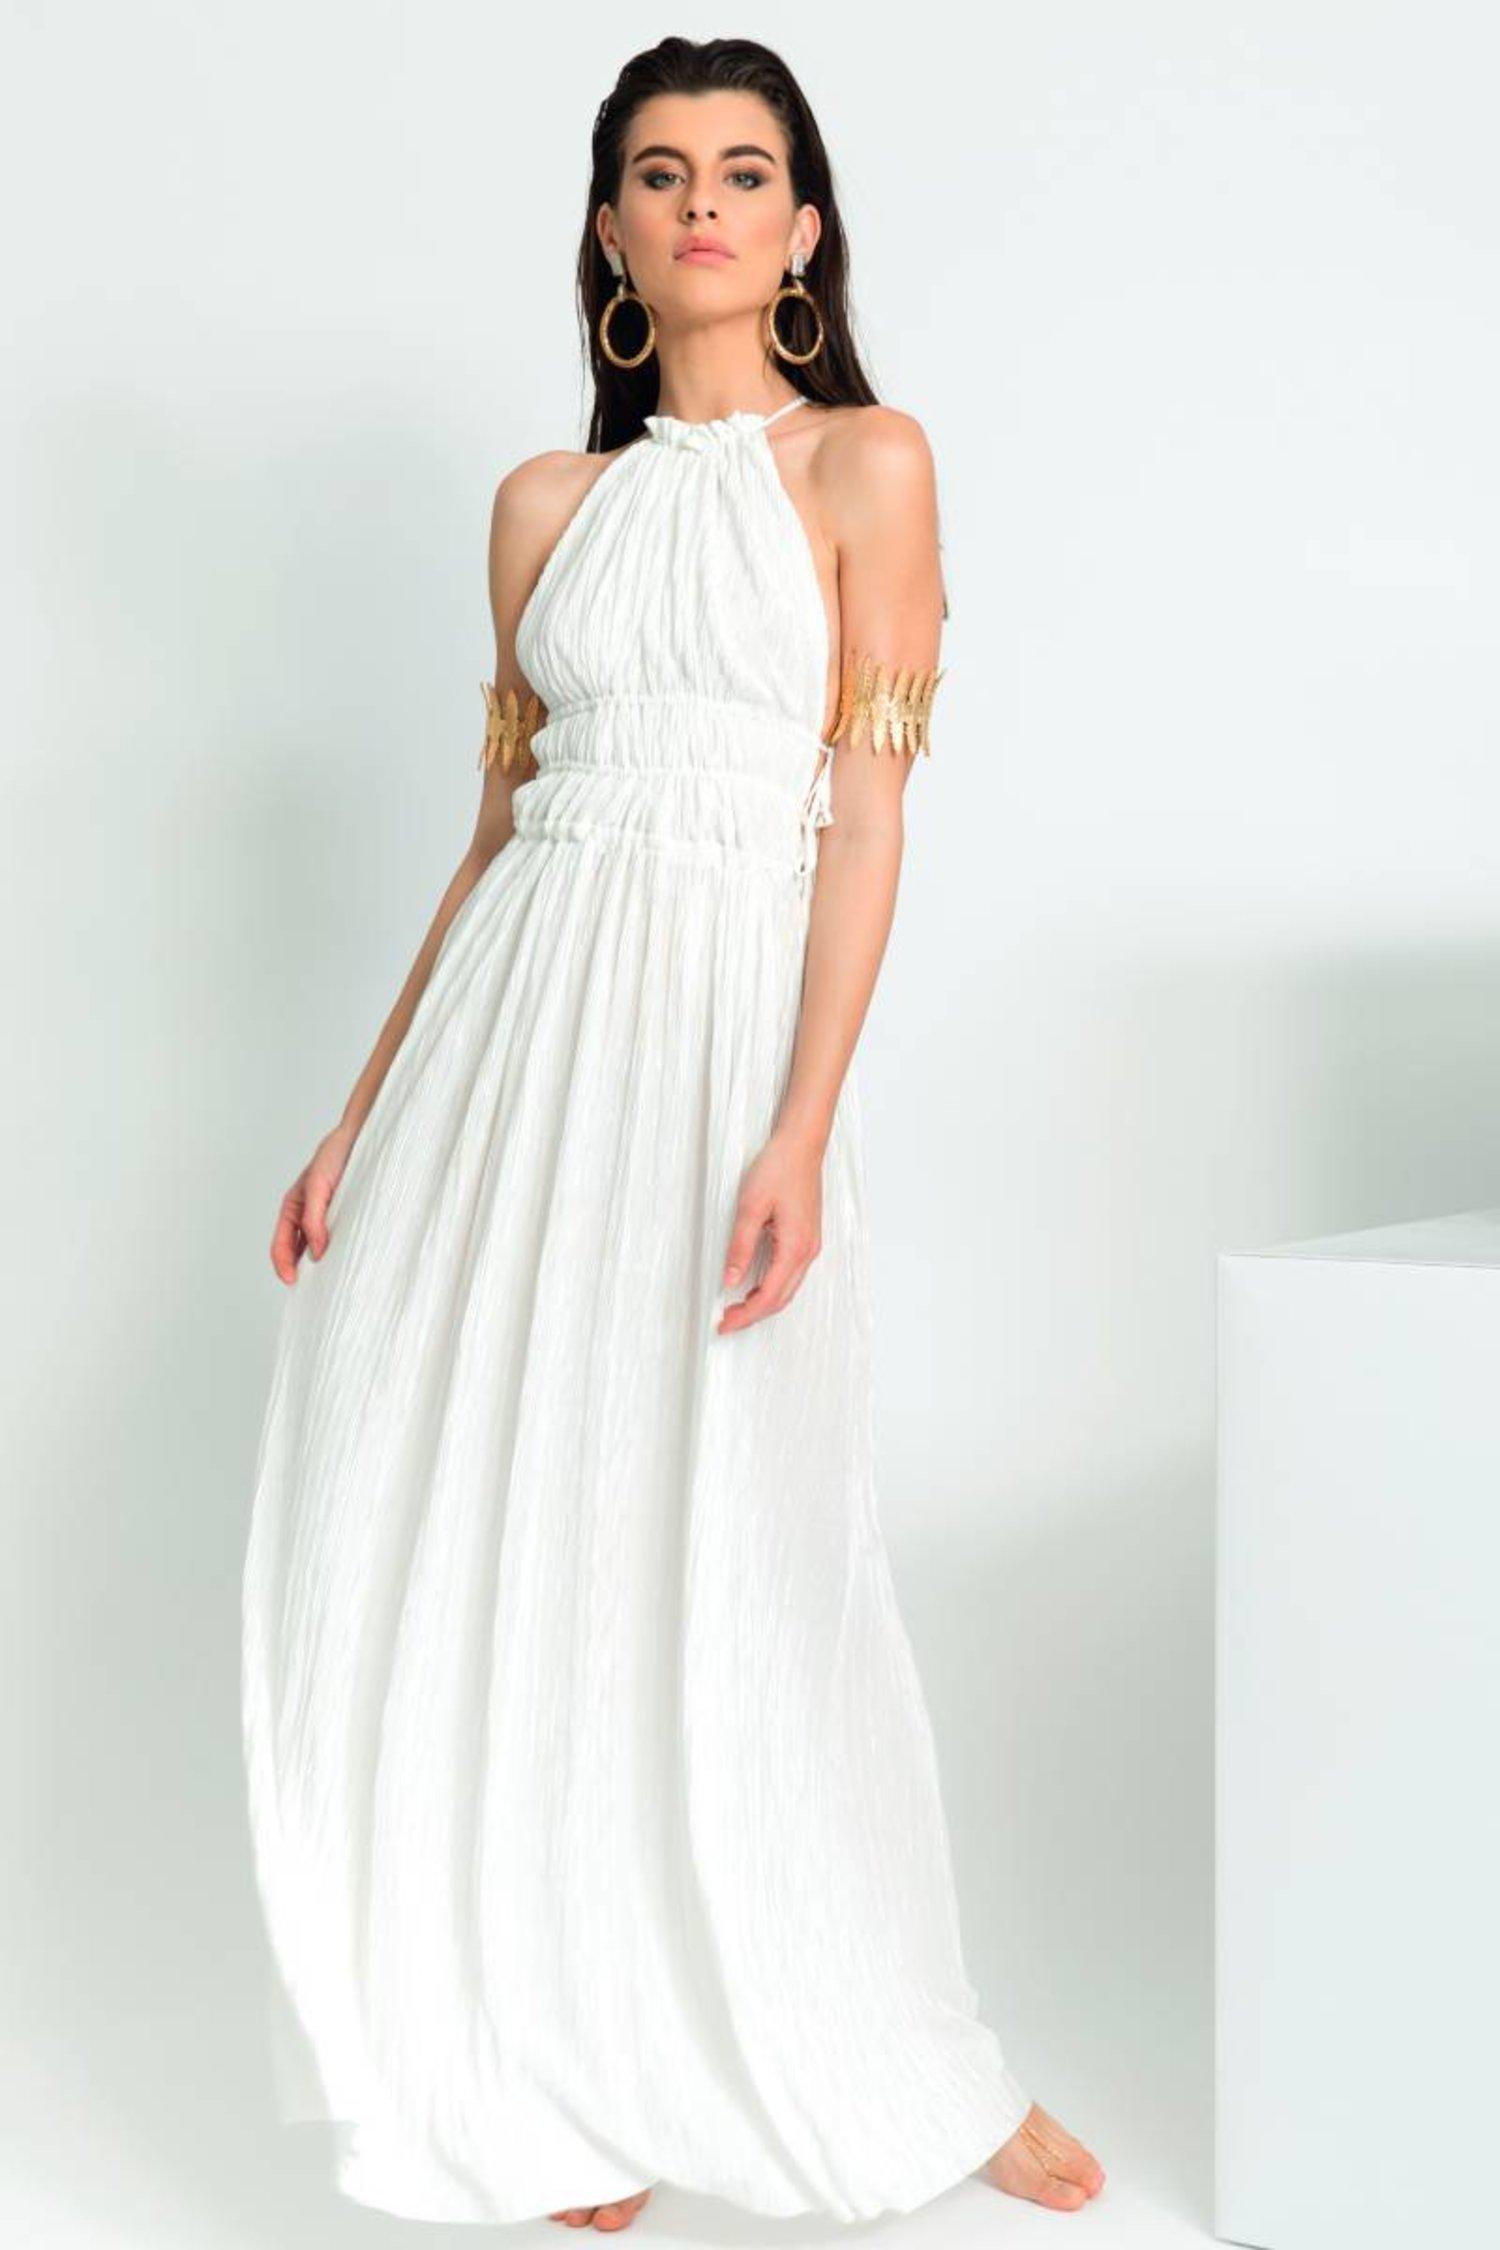 LONG DRESS HALTER NECKLINE PLEATED SOLID COLOUR - Plisse' Bianco